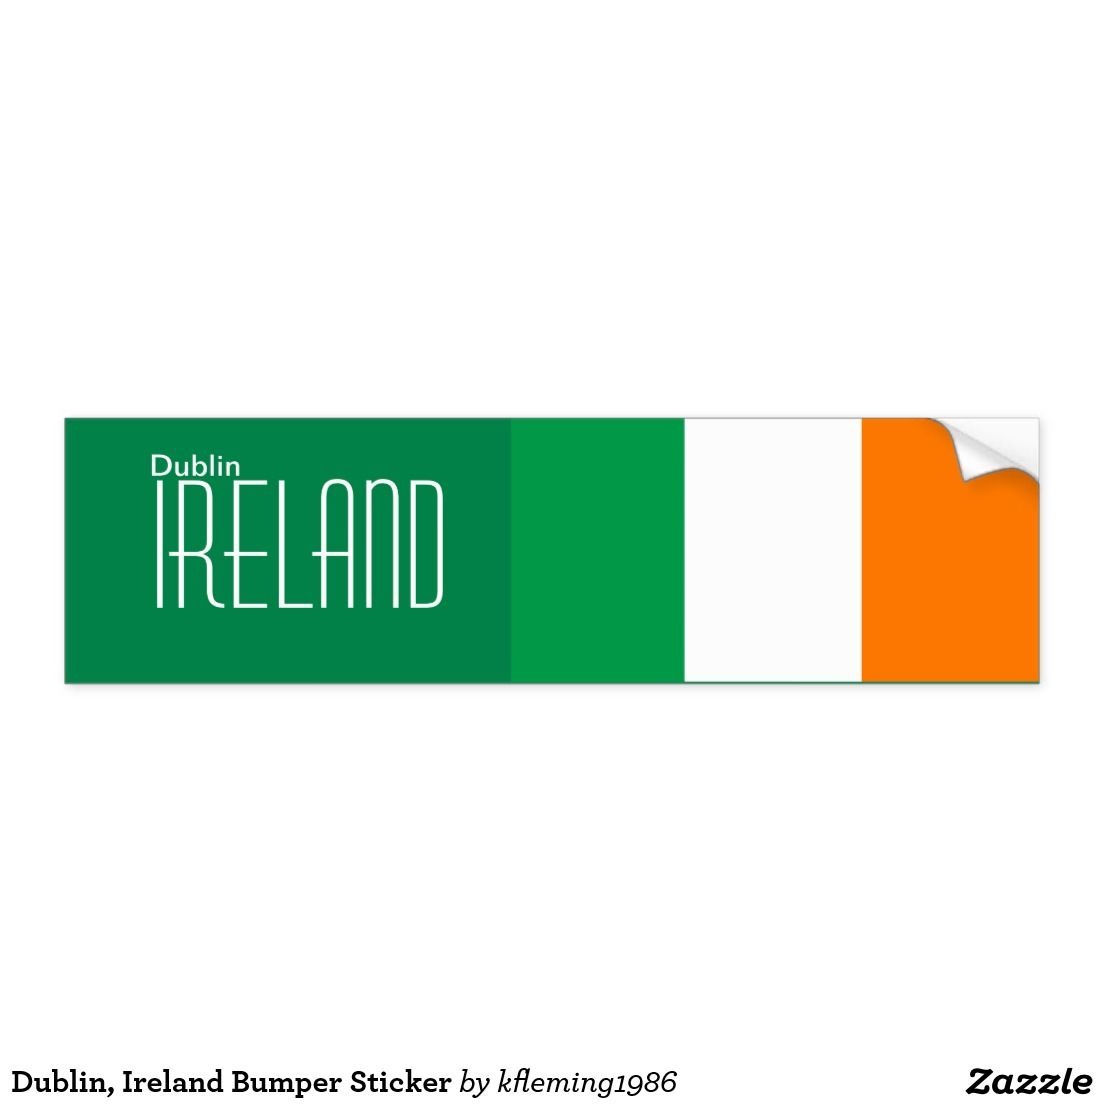 Dublin Ireland Bumper Sticker Bumper Stickers Bumpers Stickers [ 1104 x 1104 Pixel ]